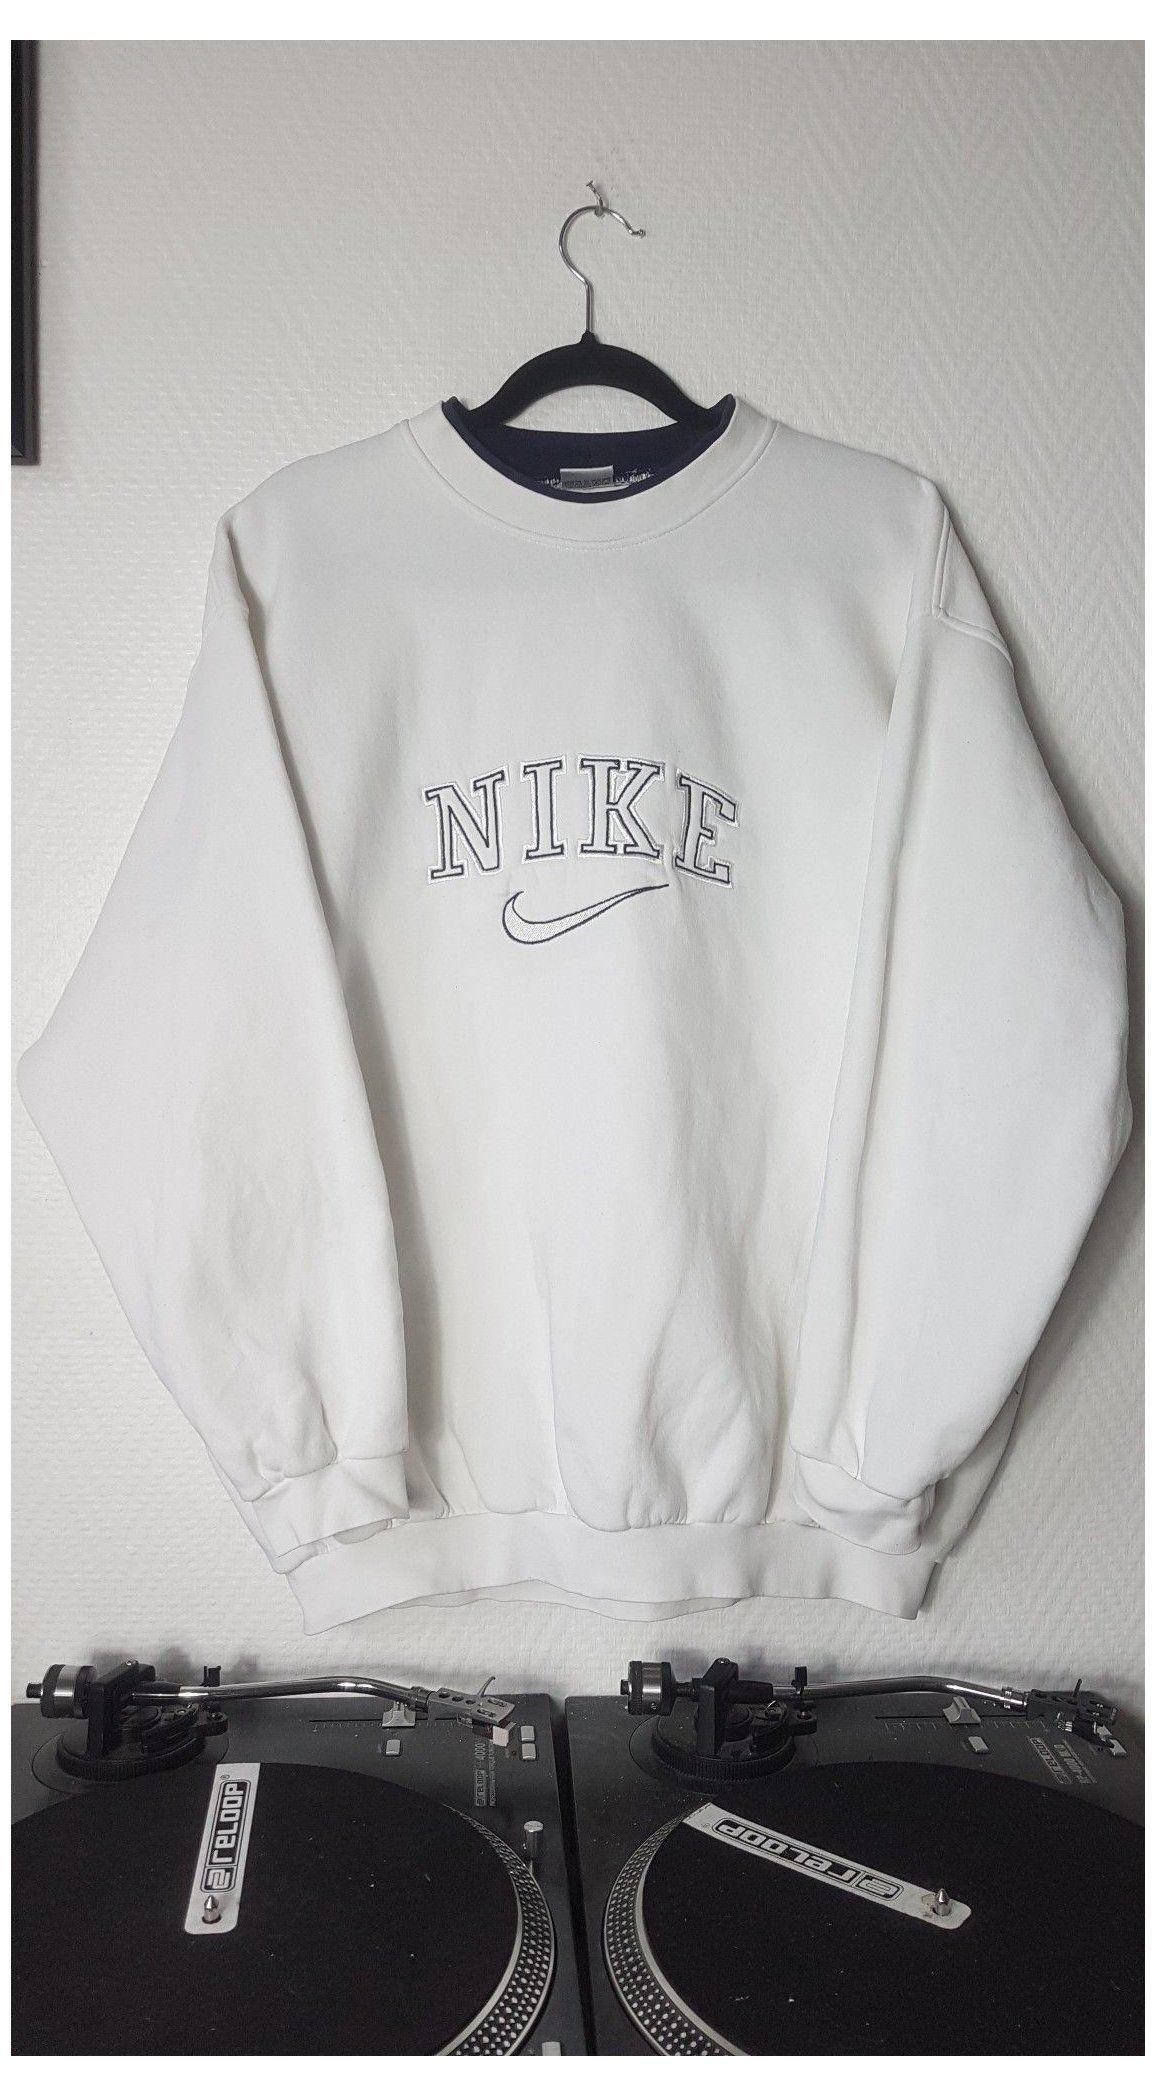 nike crewneck sweatshirt women outfit